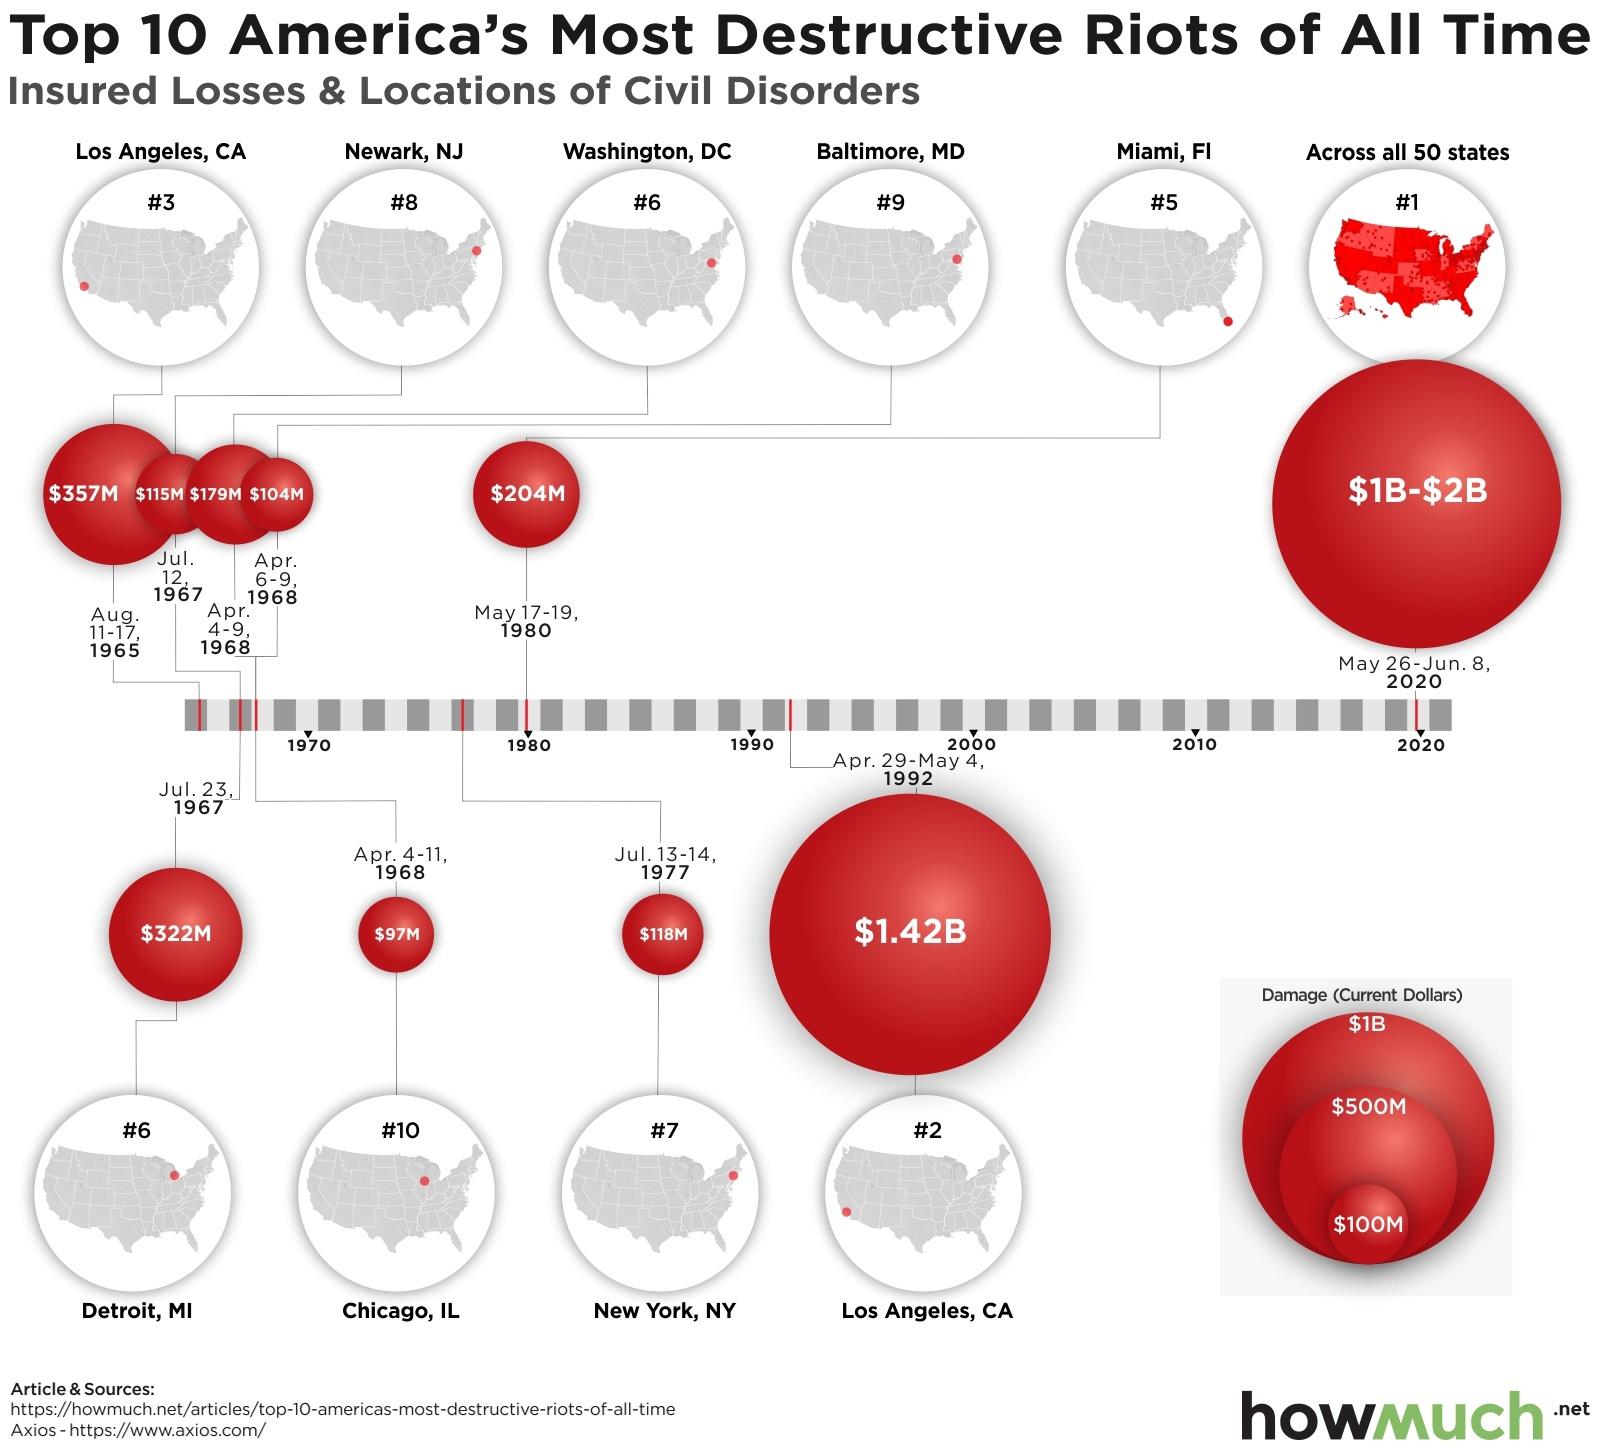 Costliest civil disorders